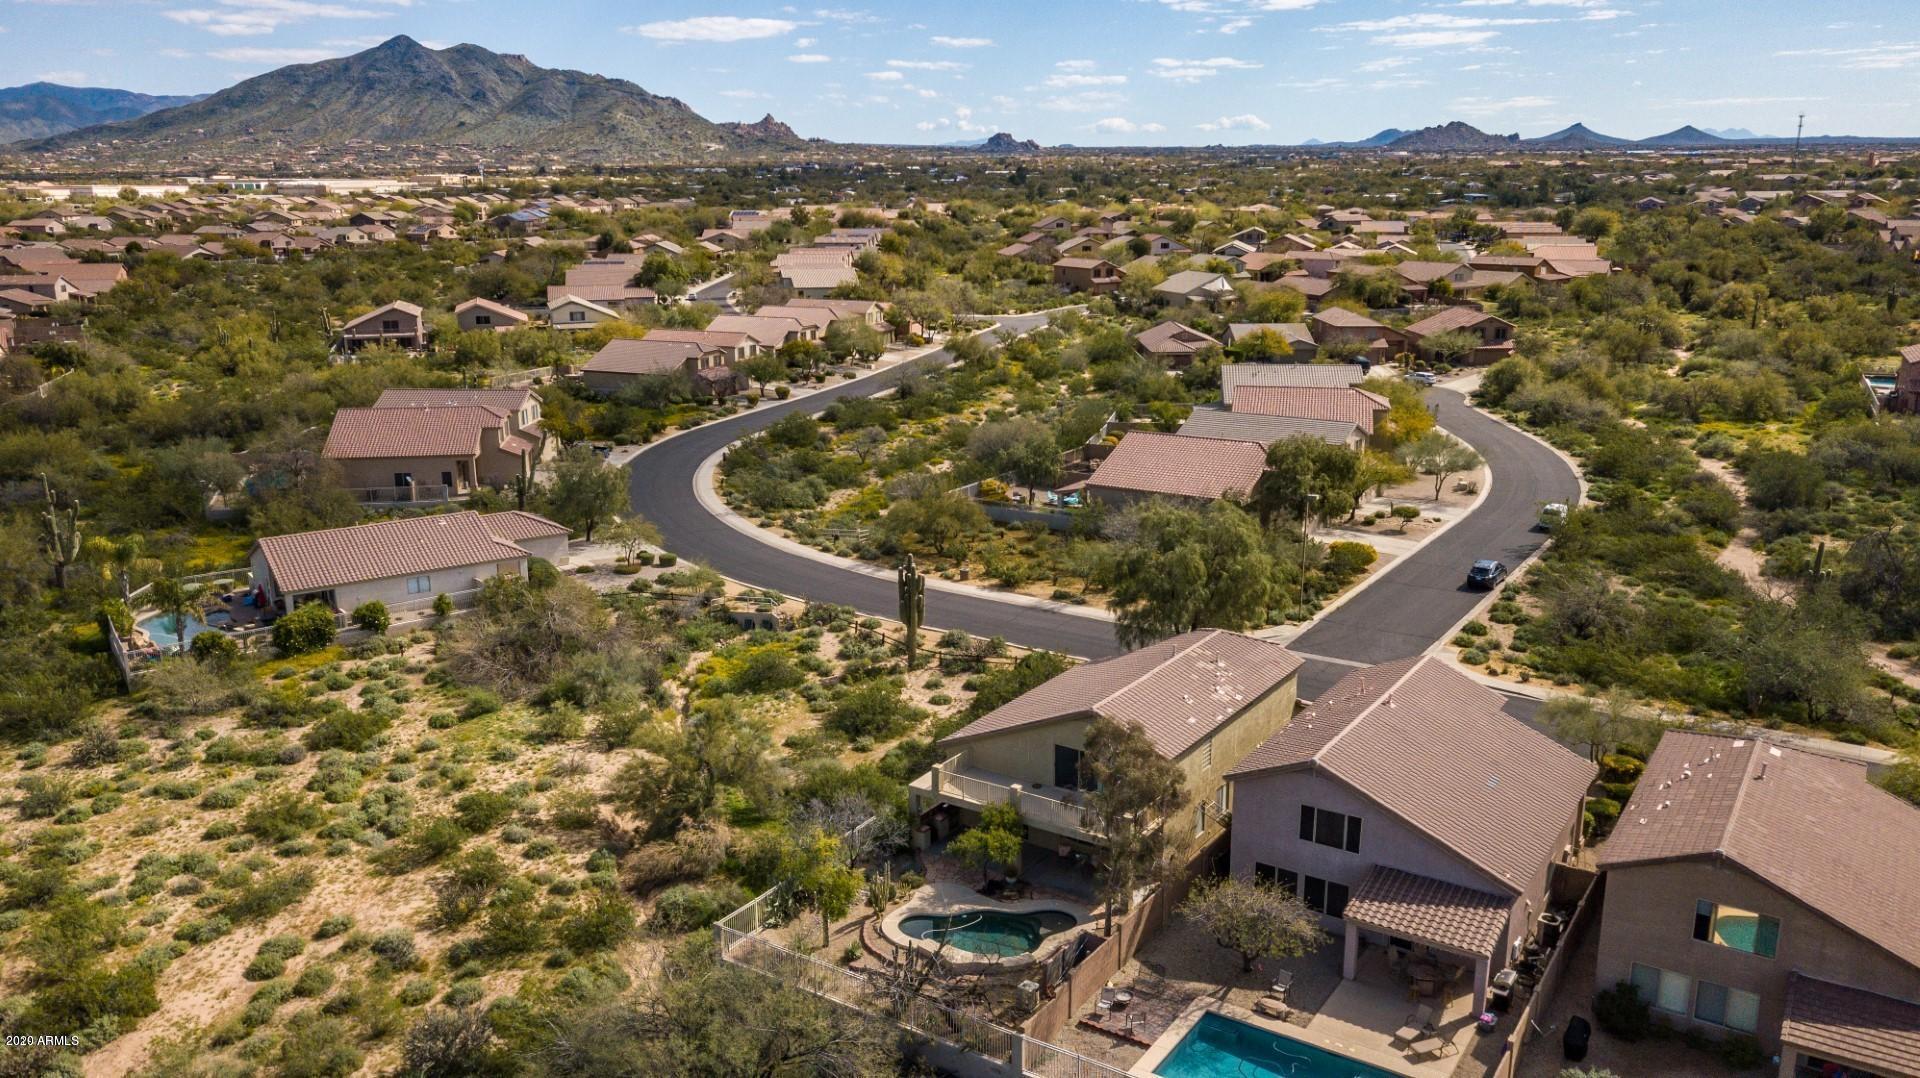 MLS 6157974 33447 N SYMER Drive, Cave Creek, AZ 85331 Cave Creek AZ Dove Valley Ranch